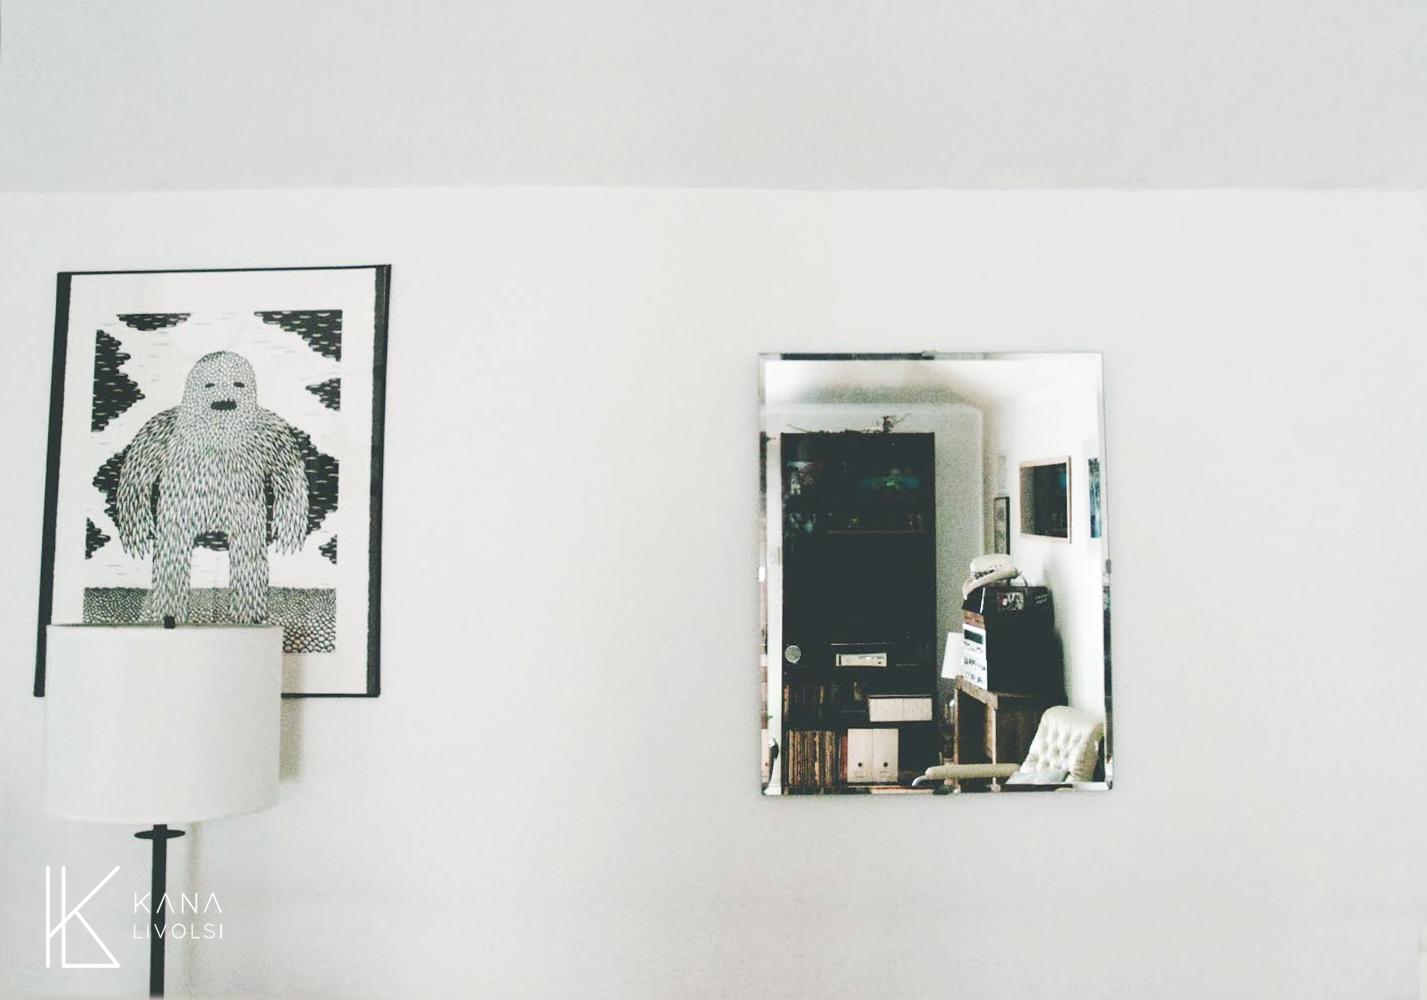 #photography #austin #texas #bandphoto#kana #livolsi #kanalivolsi #photoshoot #photos #artistphotography #headshots #atx #austintexas #designer #design #video #comedians #comedy #headshots #comedian#creativedirector #artisticdirector #productmarketingmanager #marketing #flatdesign #events #eventphotography #capitalfactory #startup #startupatx #productphotography #product #bands #musicians #swag #decor #styling #interiordesign #home #productiondesigner #production #commercials